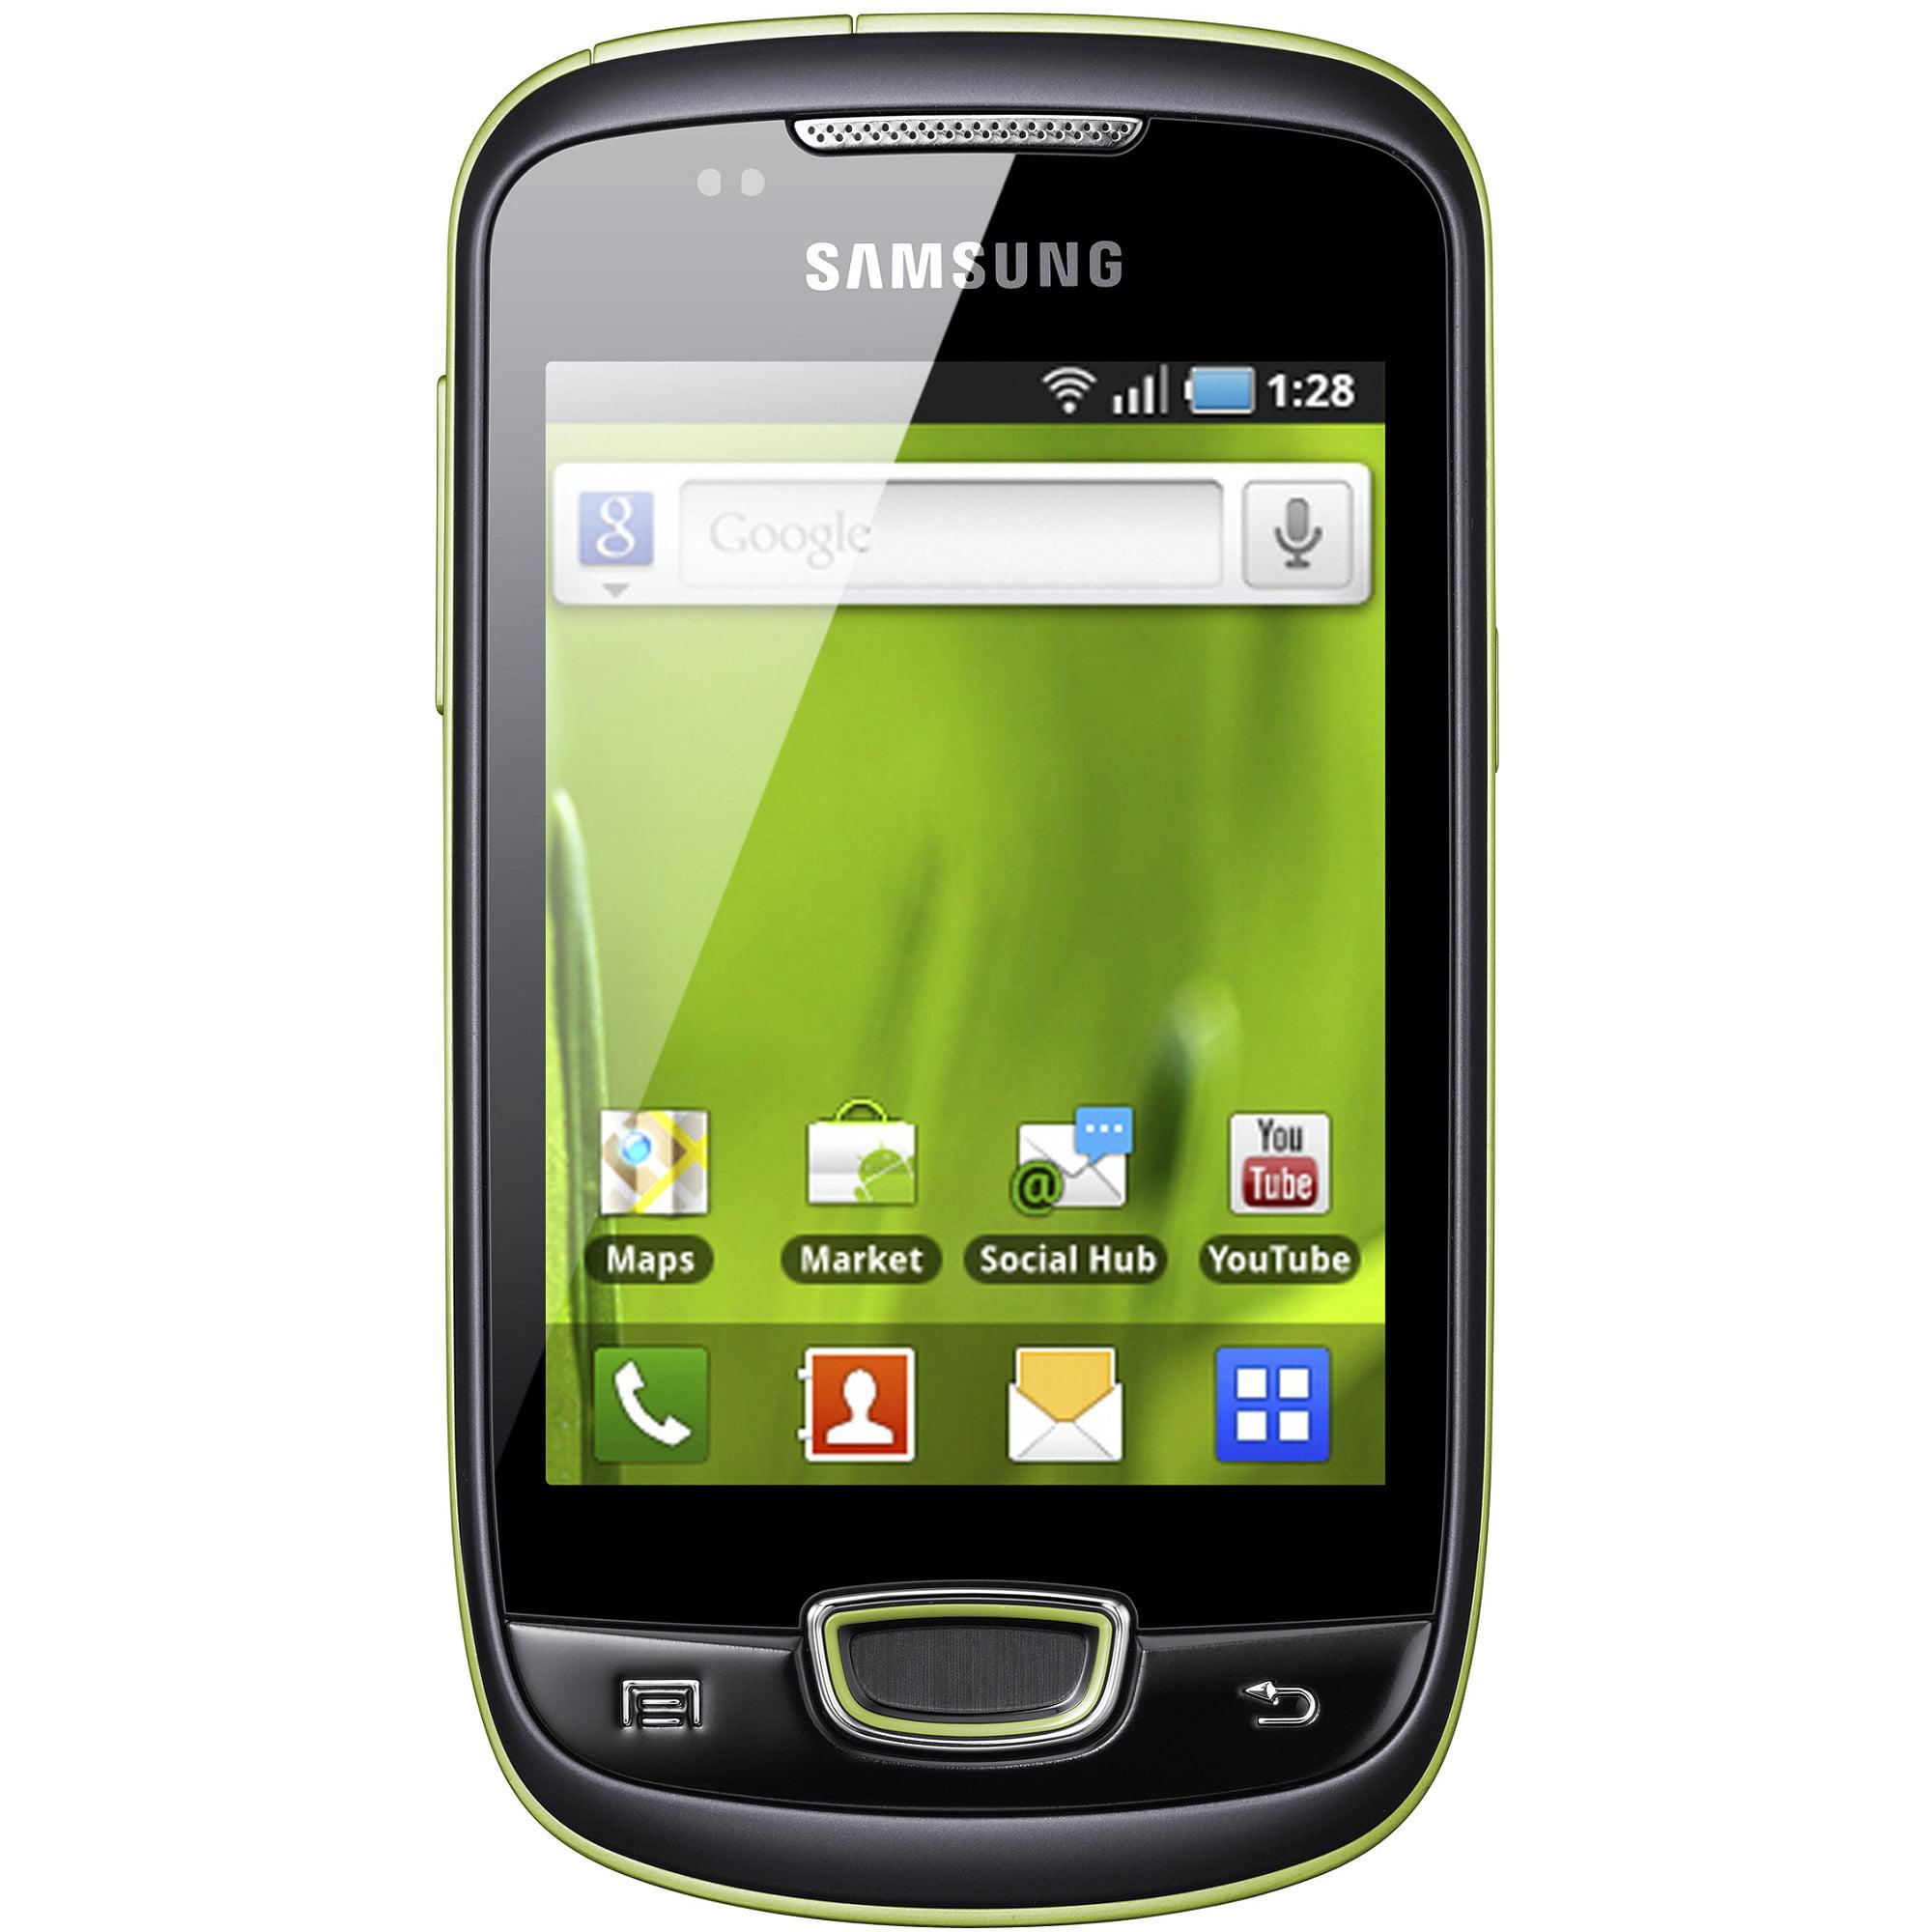 Samsung S5570 Galaxy Mini GSM Cell Phone, Black (Unlocked)